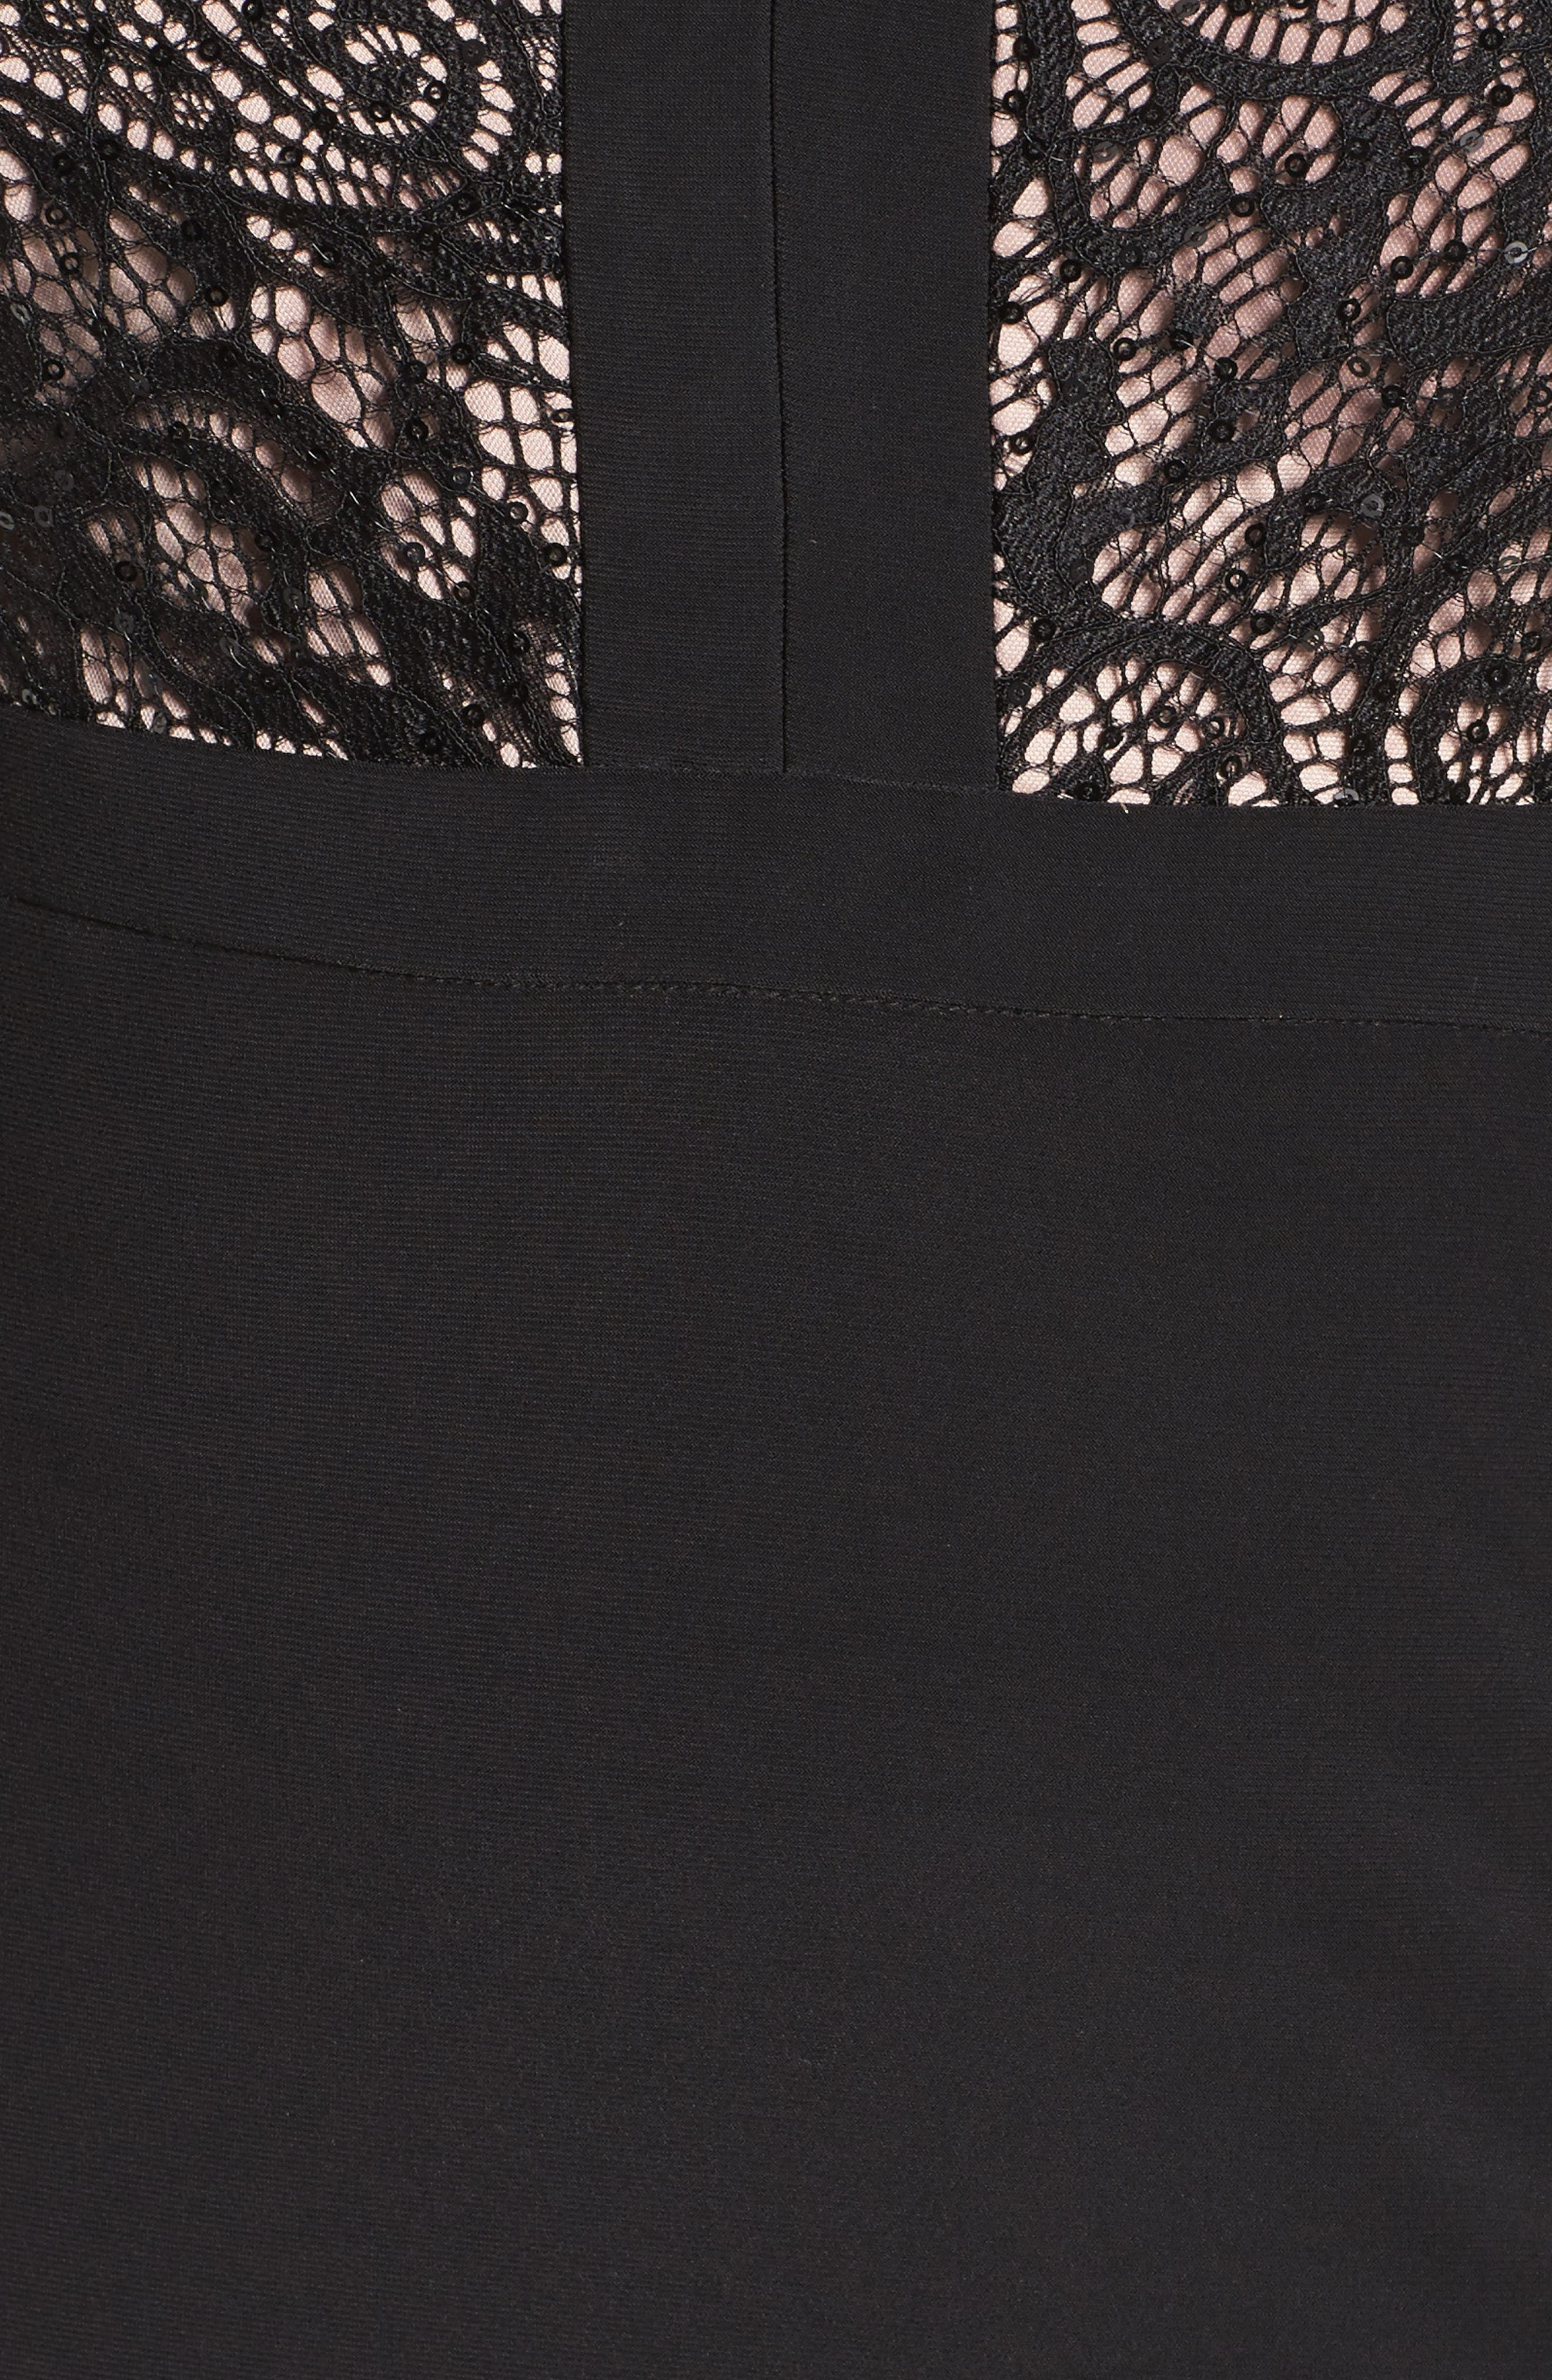 MORGAN & CO.,                             Lace Bodice Dress,                             Alternate thumbnail 5, color,                             BLACK/ NUDE